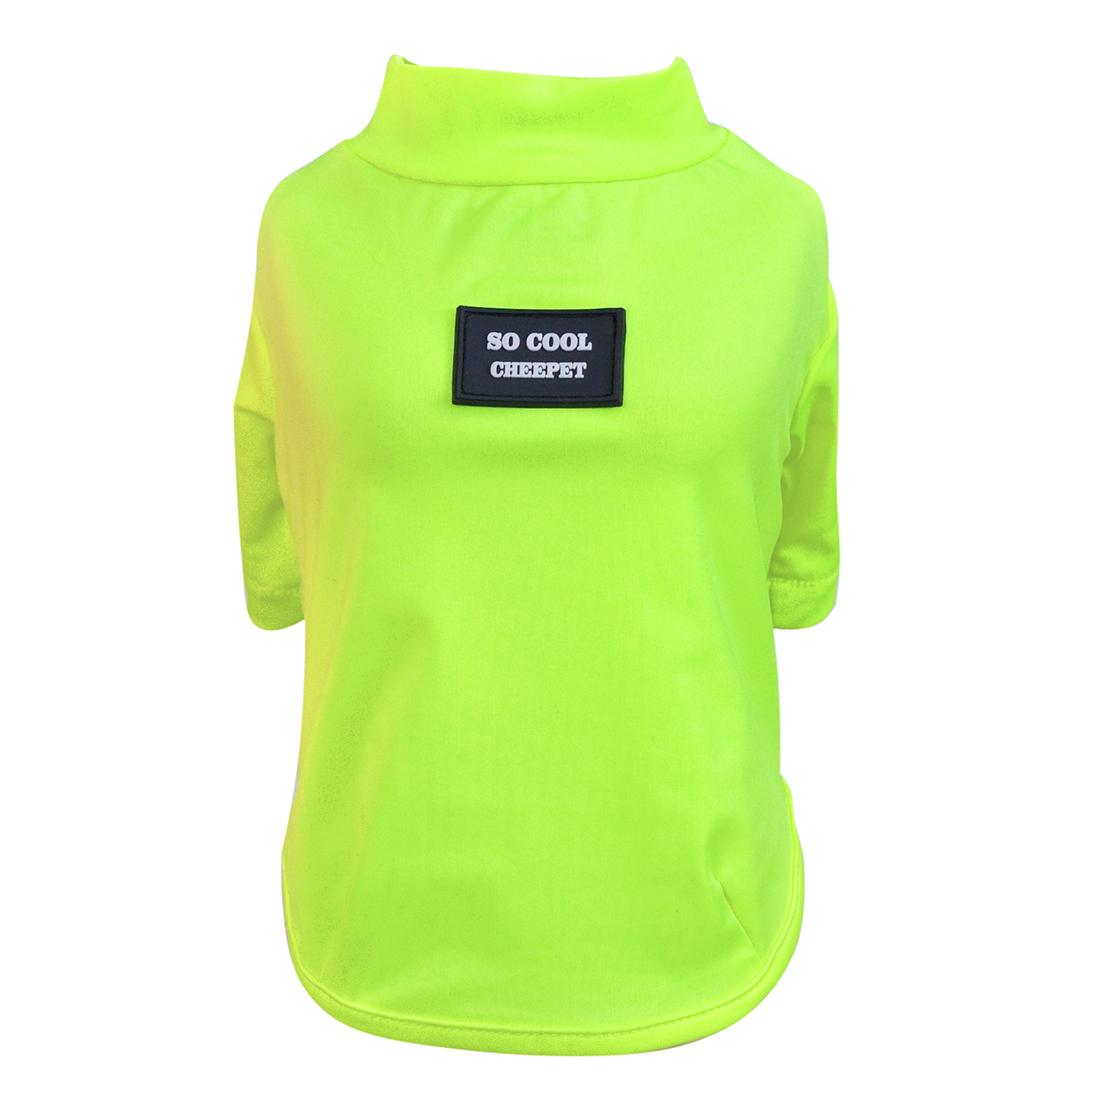 Dog Cat Summer Shirt Clothes Bright Color Solid color Fluorescent Yellow FB